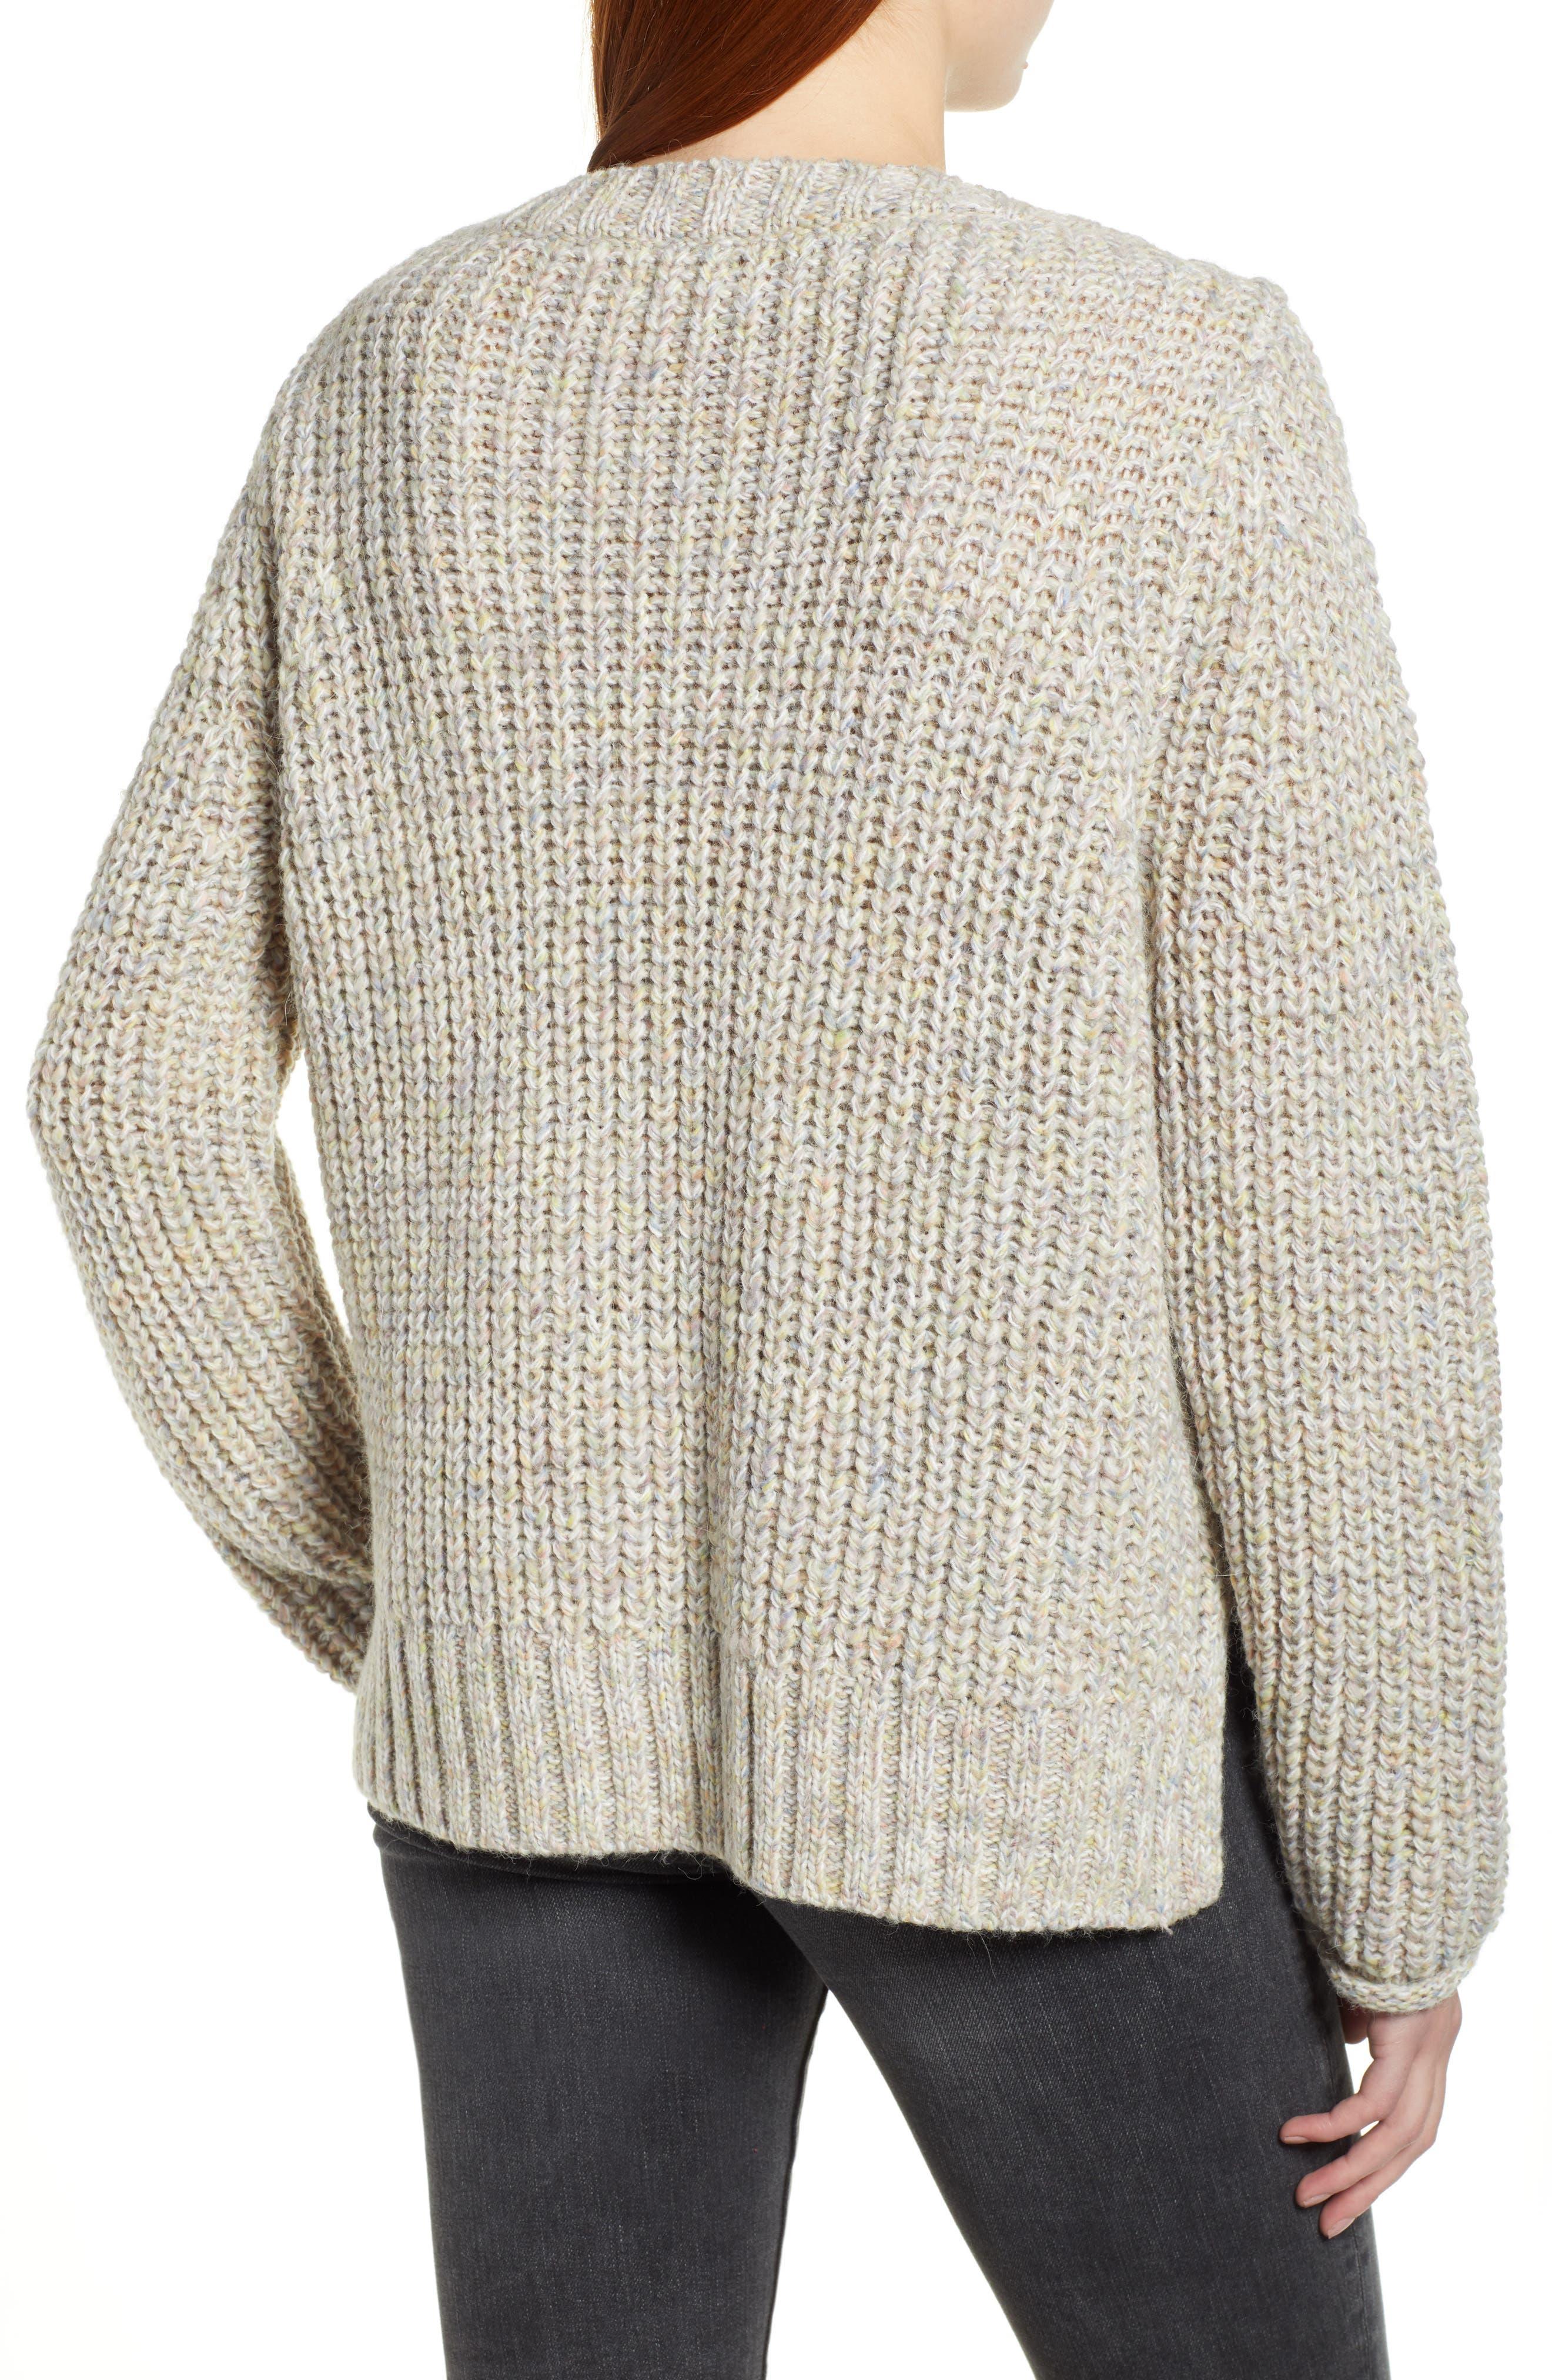 Boat Neck Sweater,                             Alternate thumbnail 2, color,                             BEIGE POPCORN PATTERN